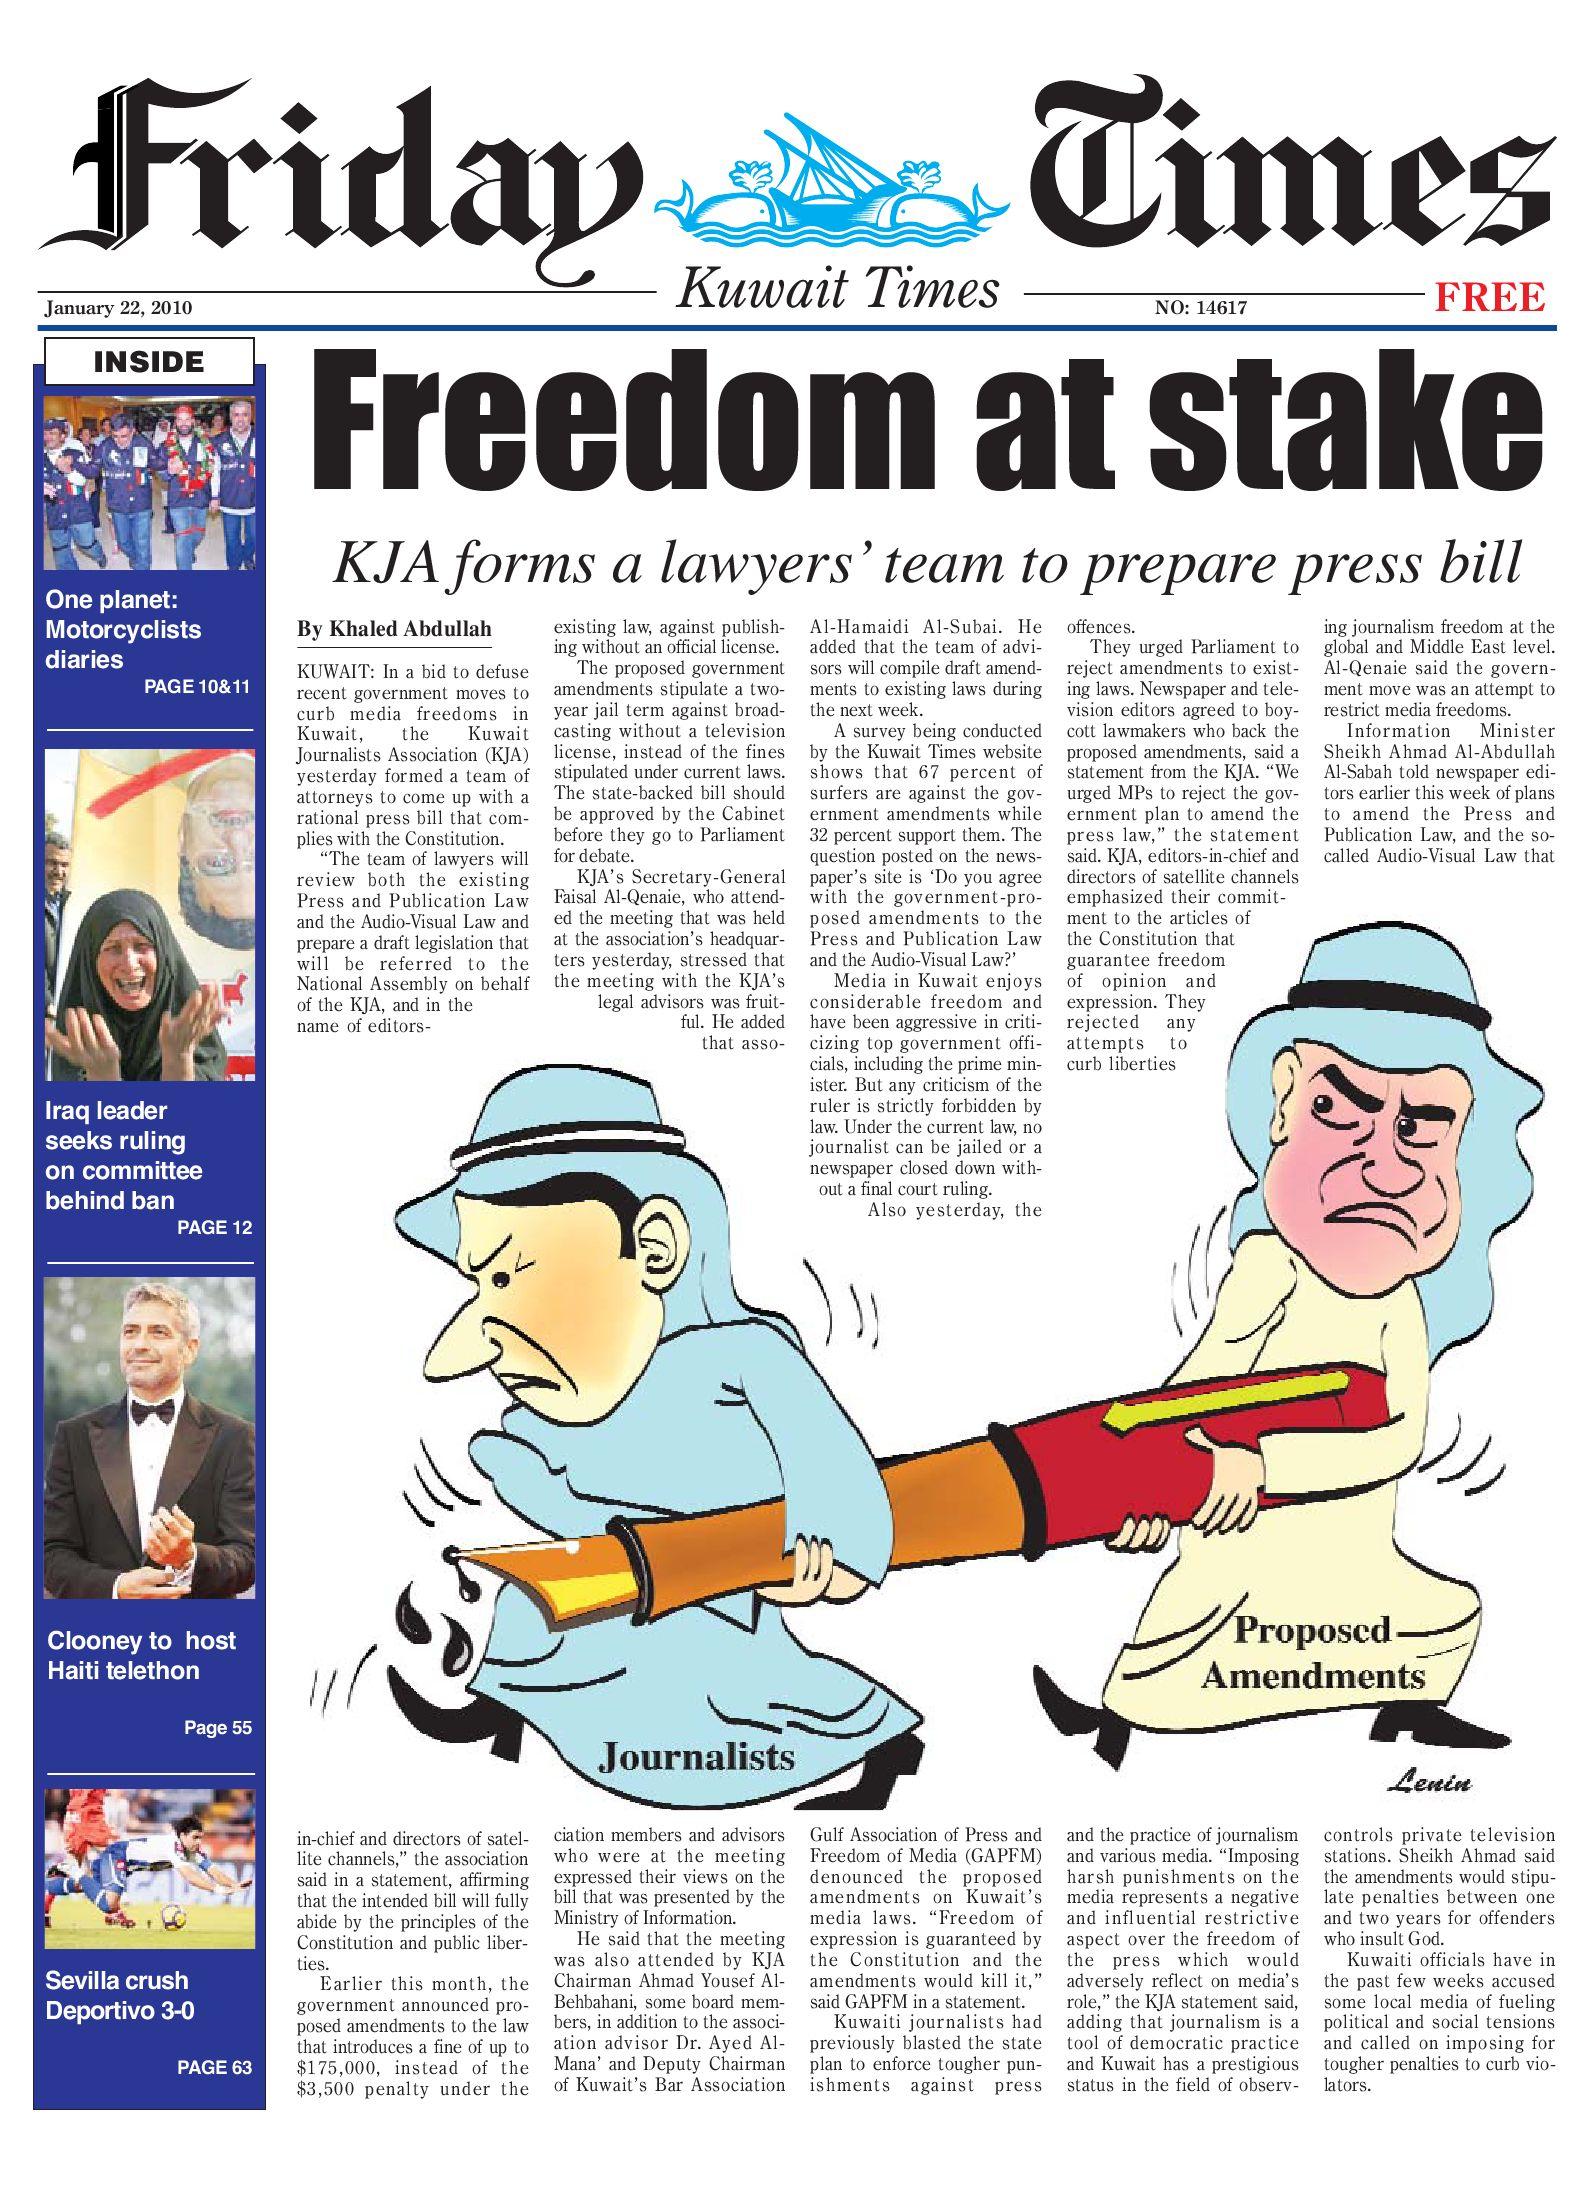 22 Jan 2010 by Kuwait Times